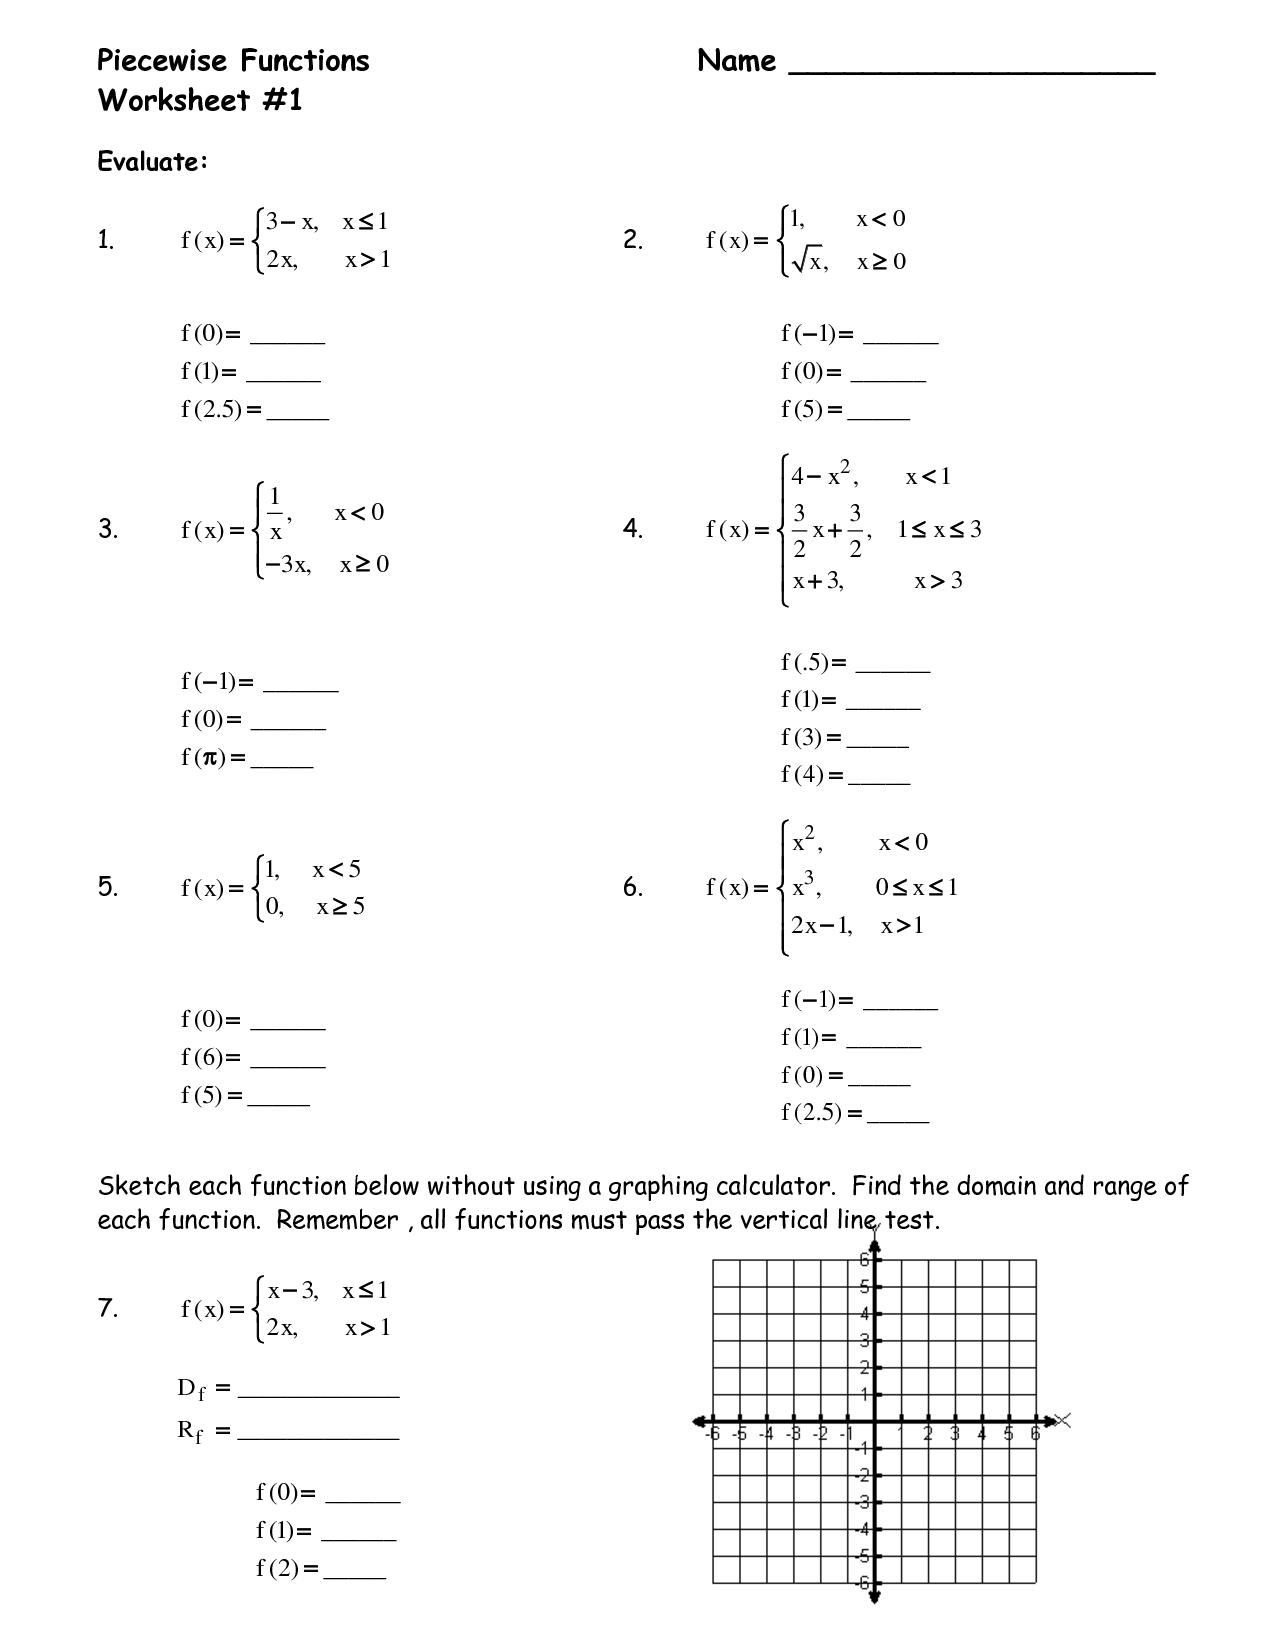 Piecewise Linear Functions Worksheet